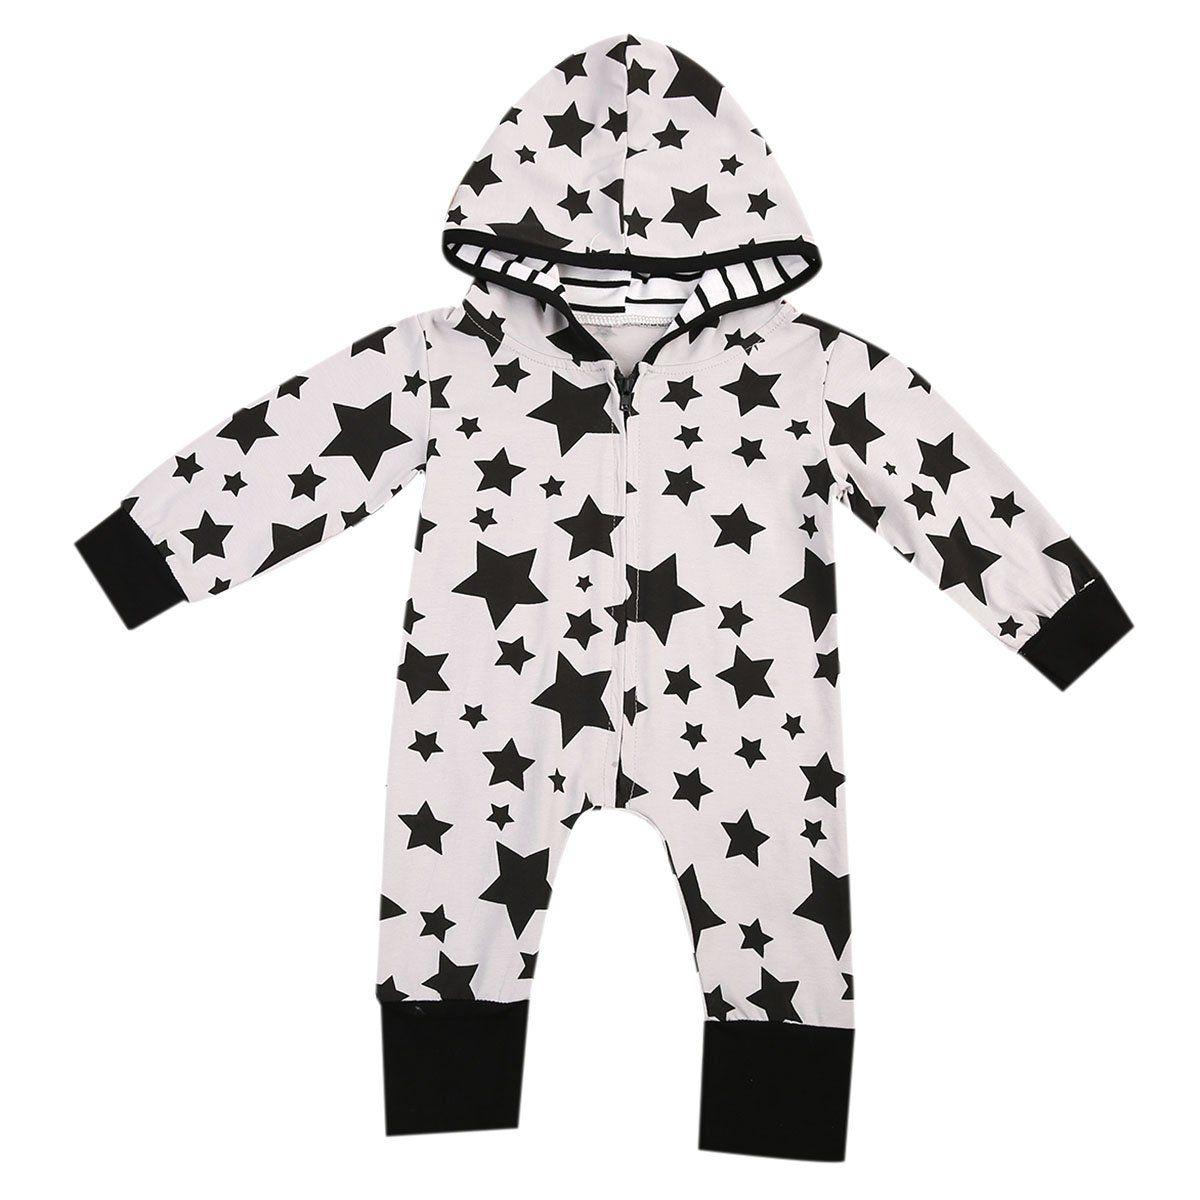 Summer Toddler Newborn Baby Boy Hooded Romper Zipper Jumpsuit Playsuit Outfit UK